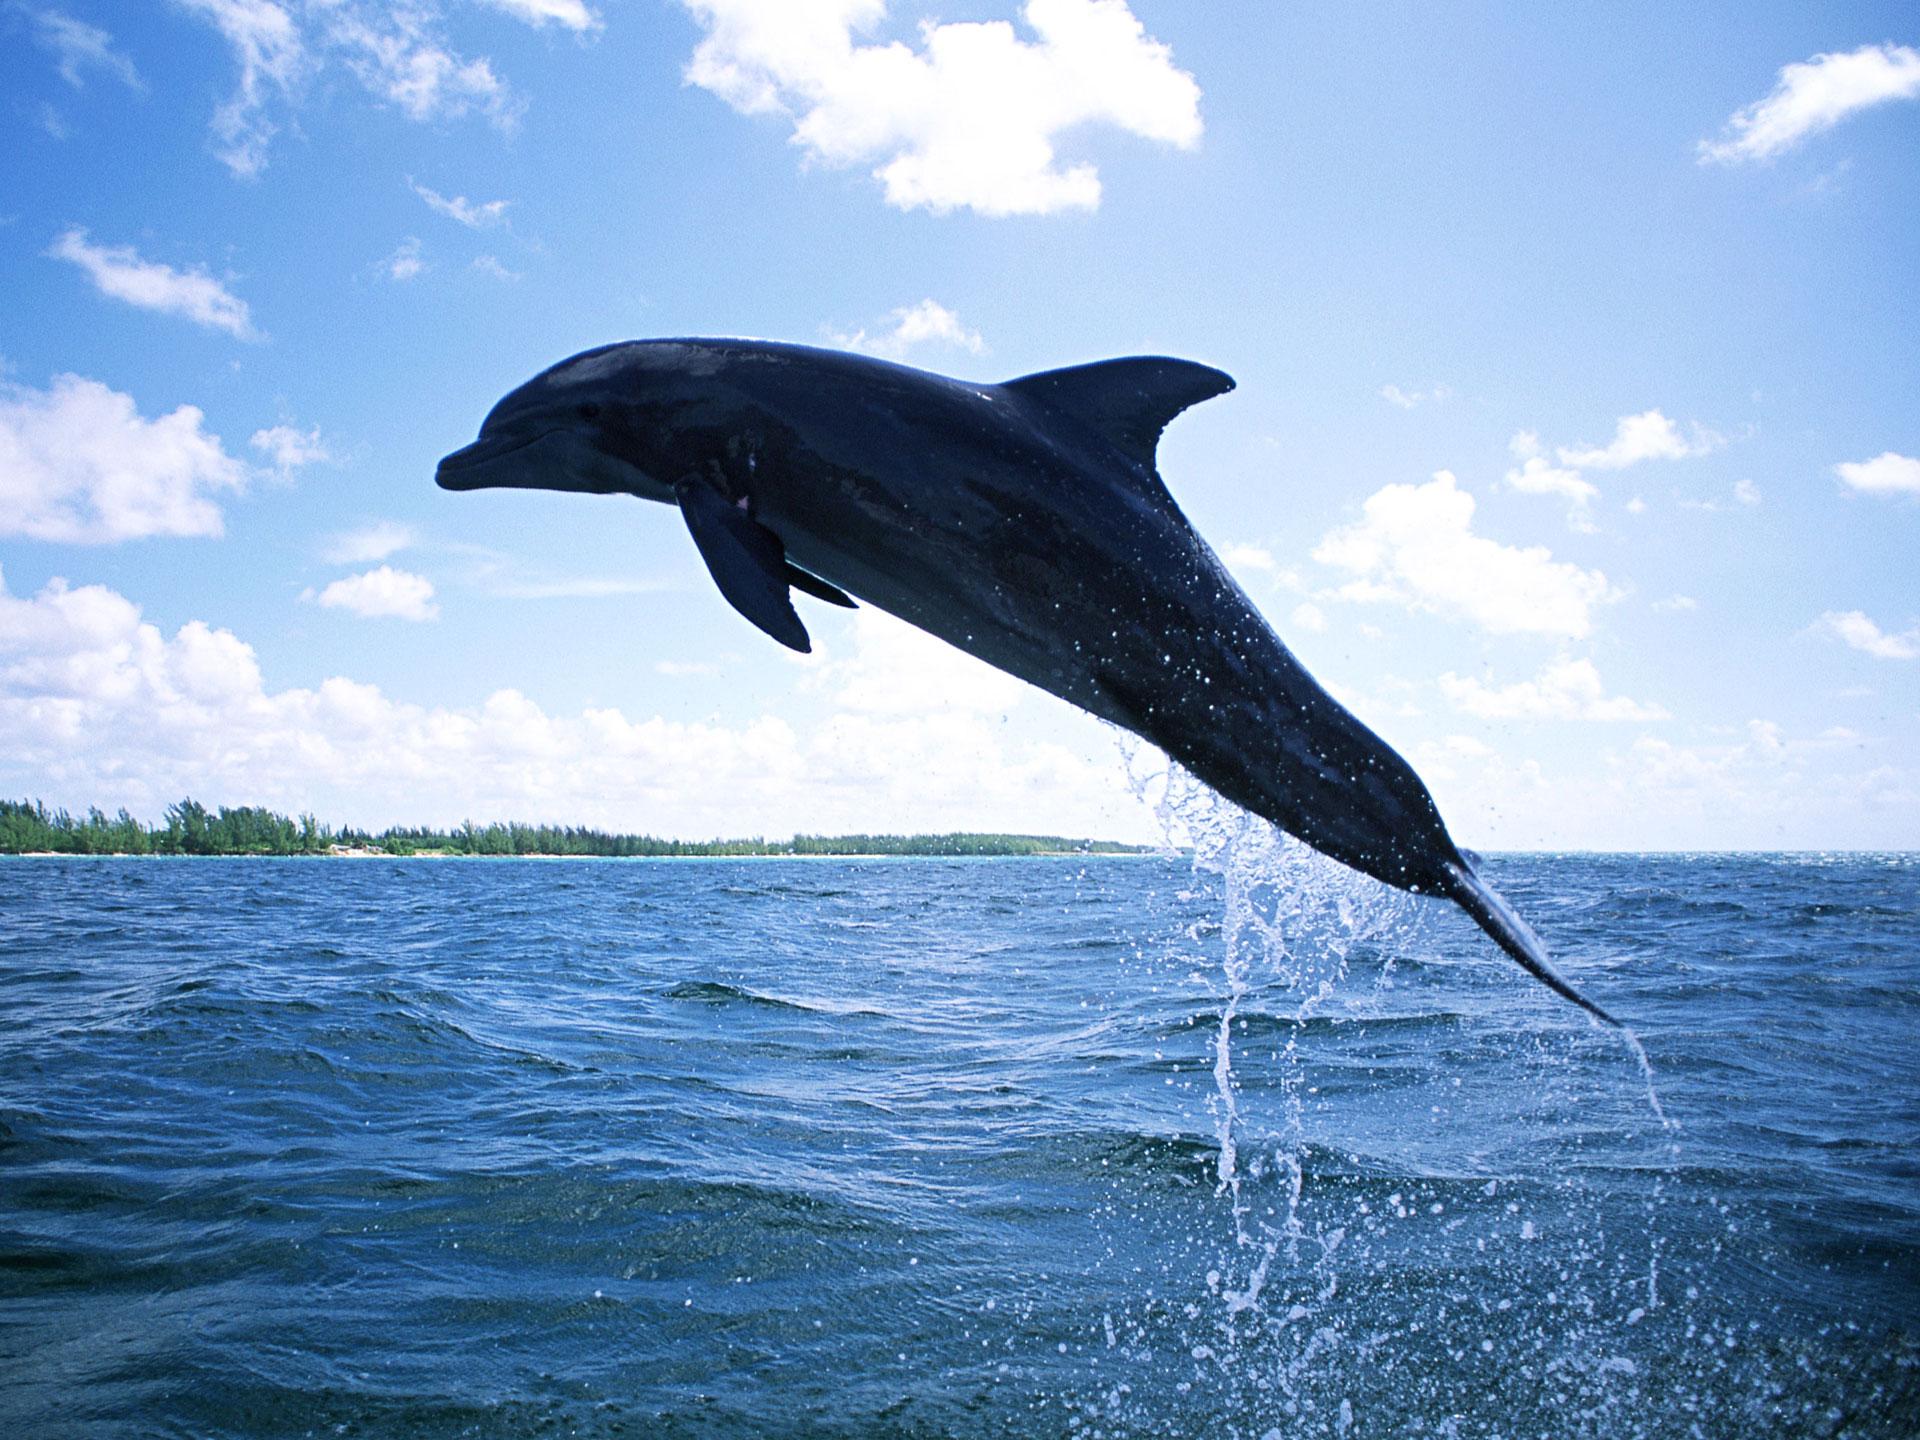 Dolphin Wallpaper For Ipad HD Wallpapers HD Wallpaper